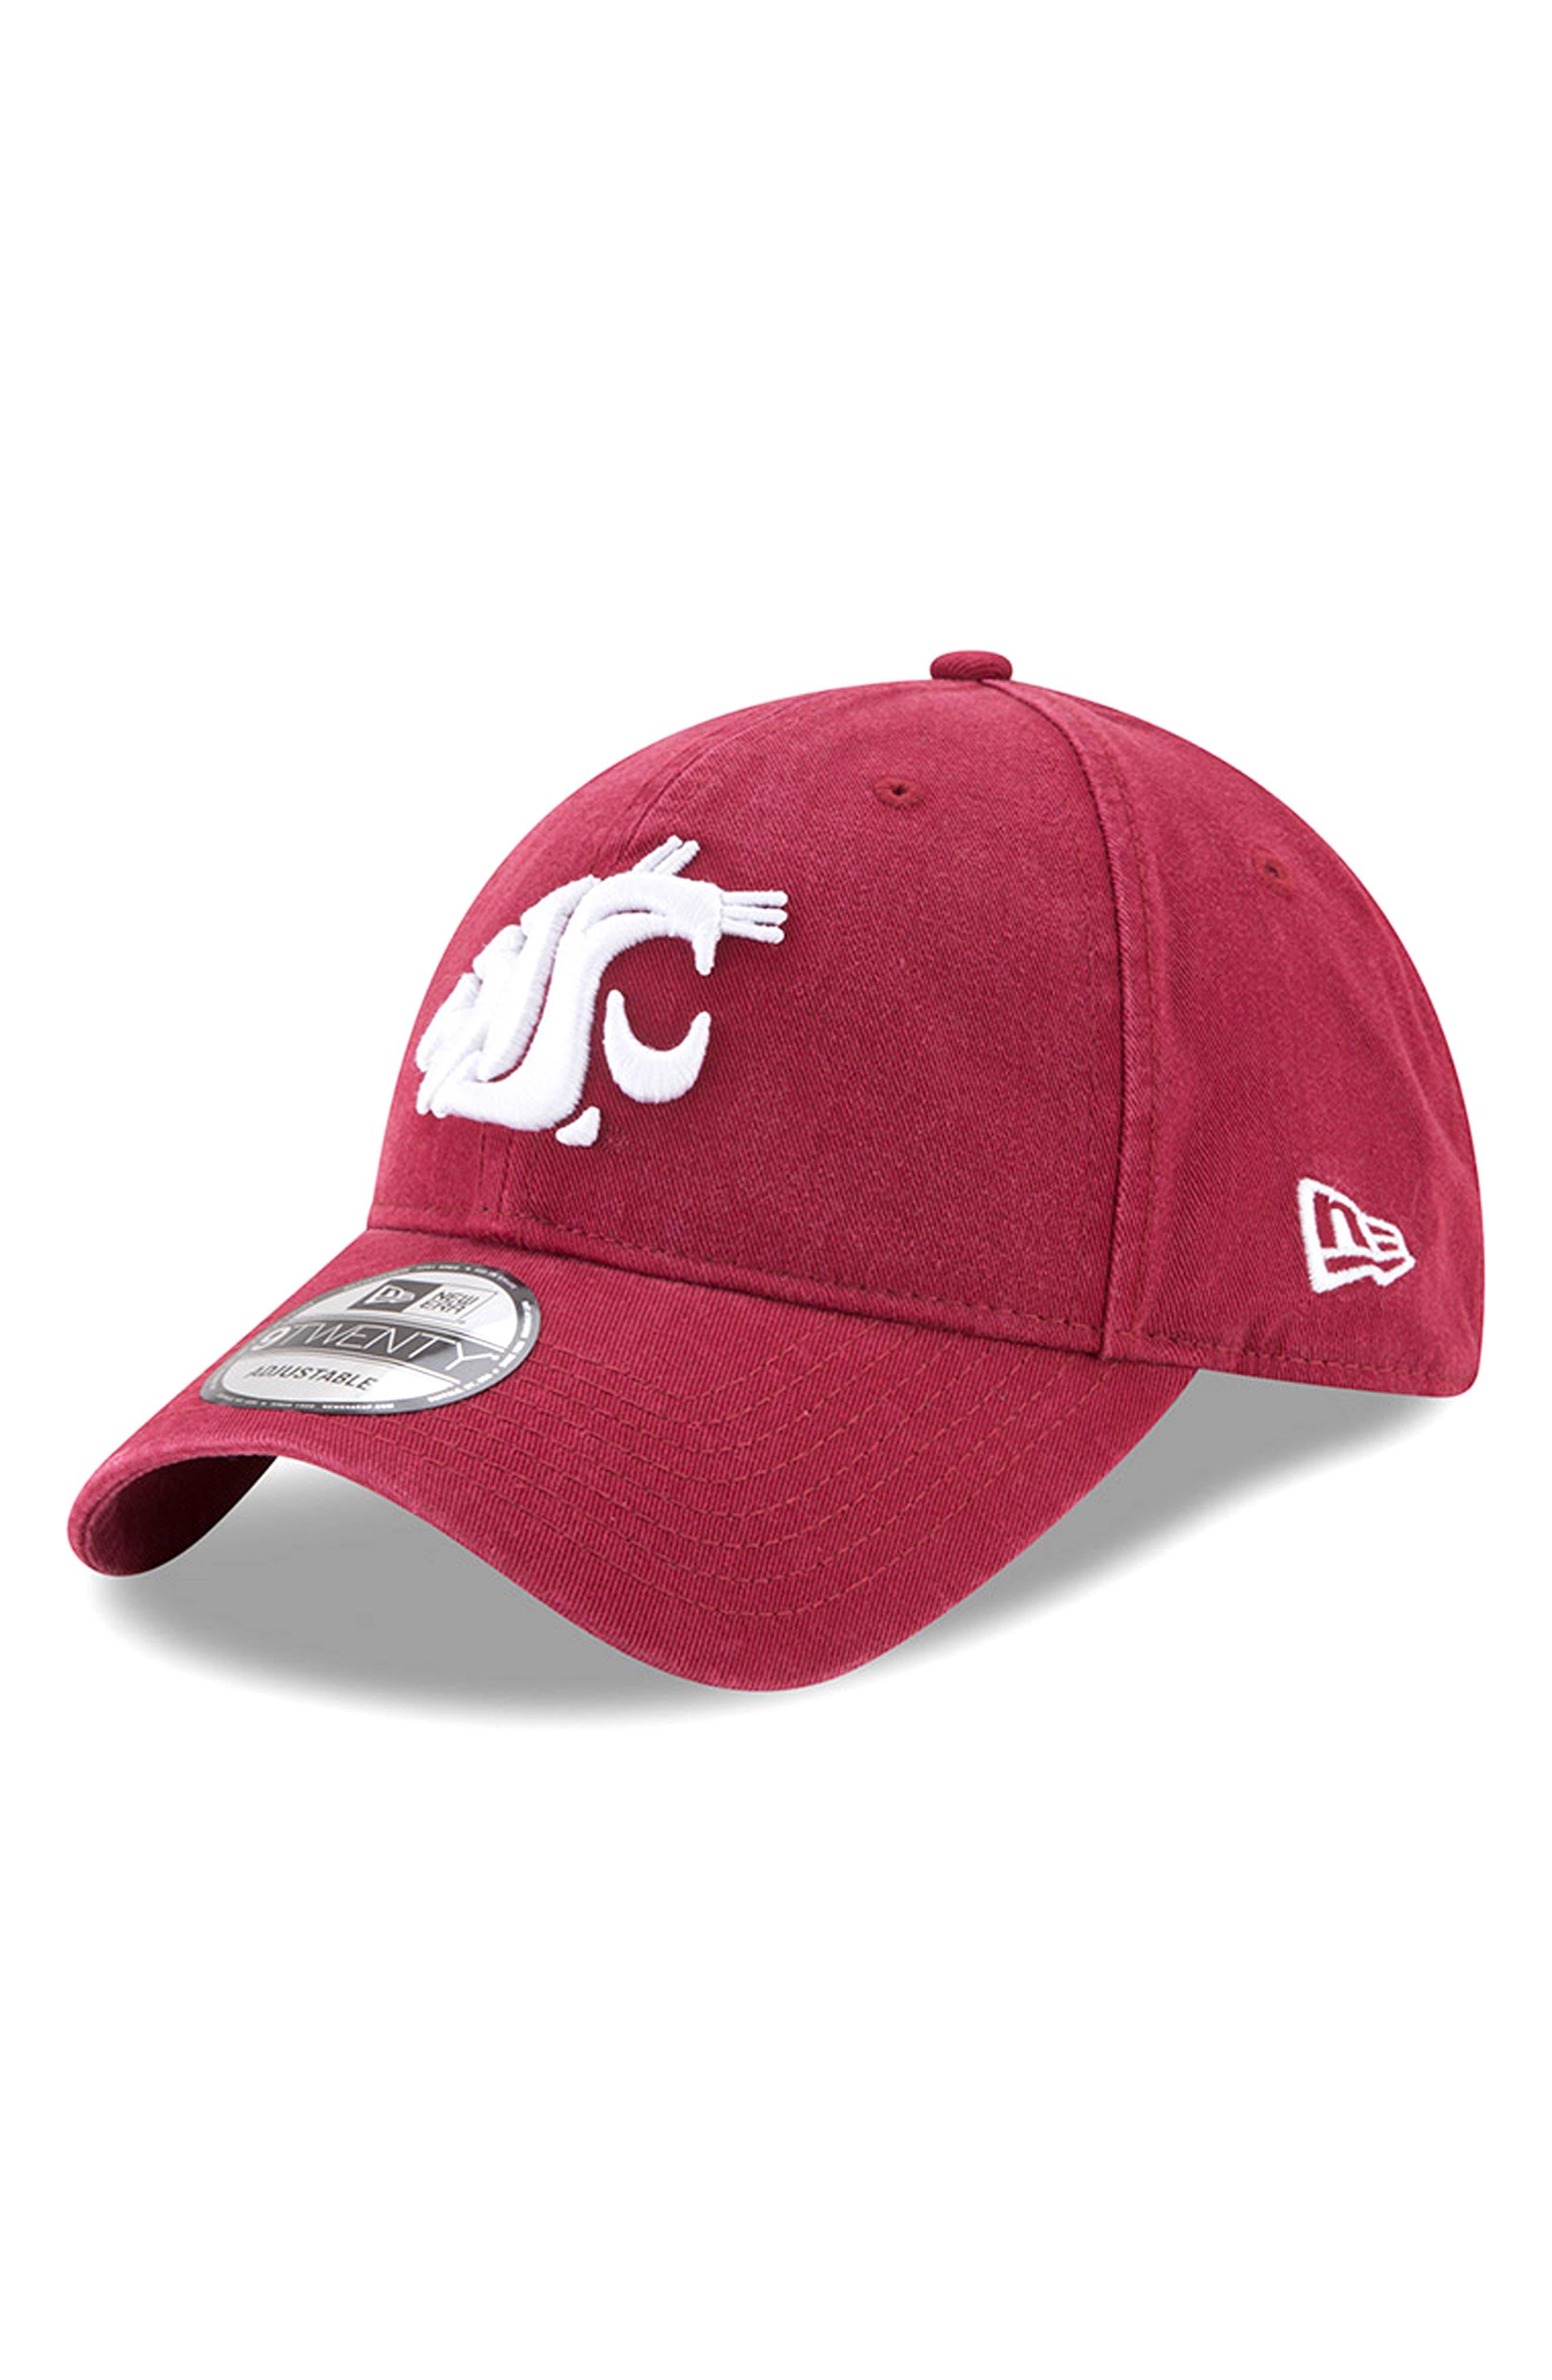 Main Image - New Era Collegiate Core Classic - Washington State Cougars Baseball Cap